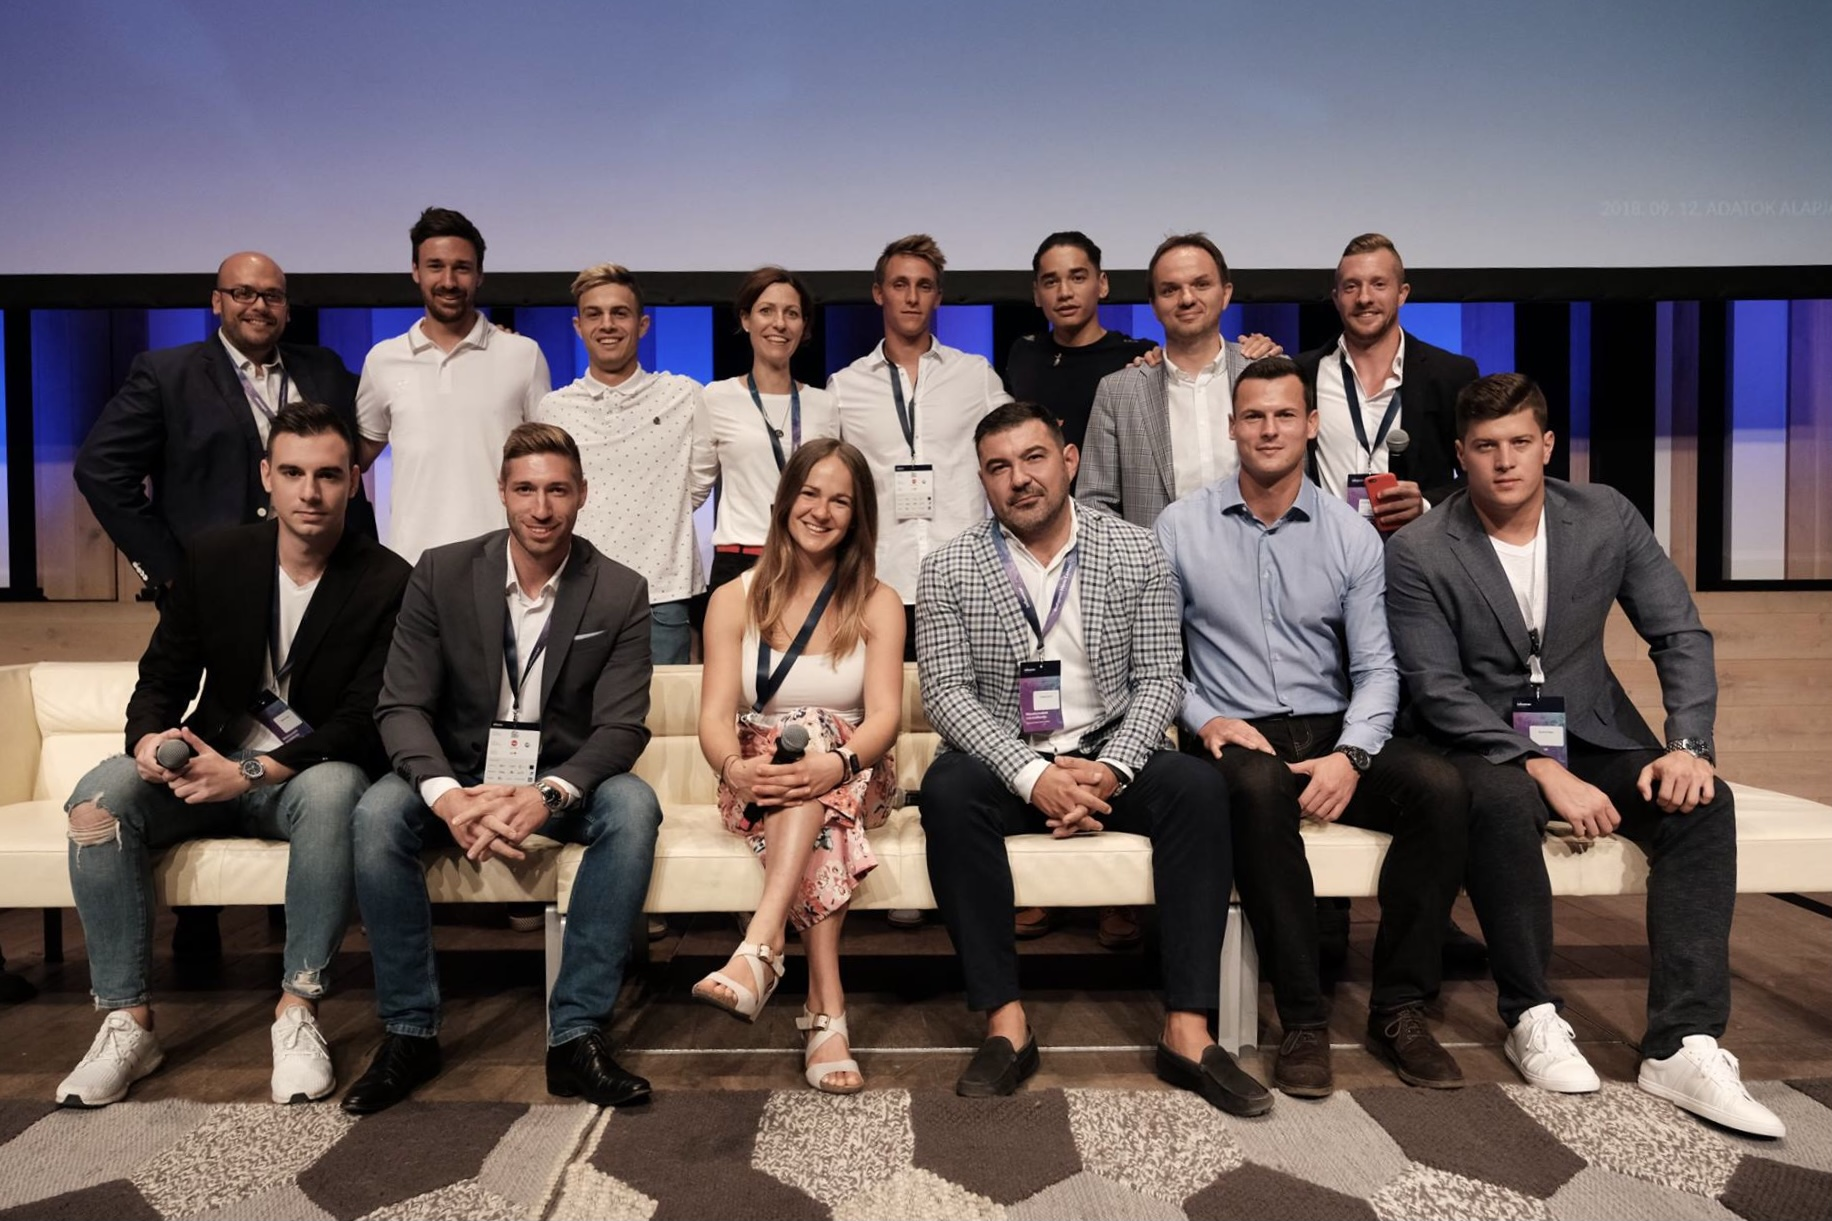 MMSZ Sportmarketing Tagozat csapata